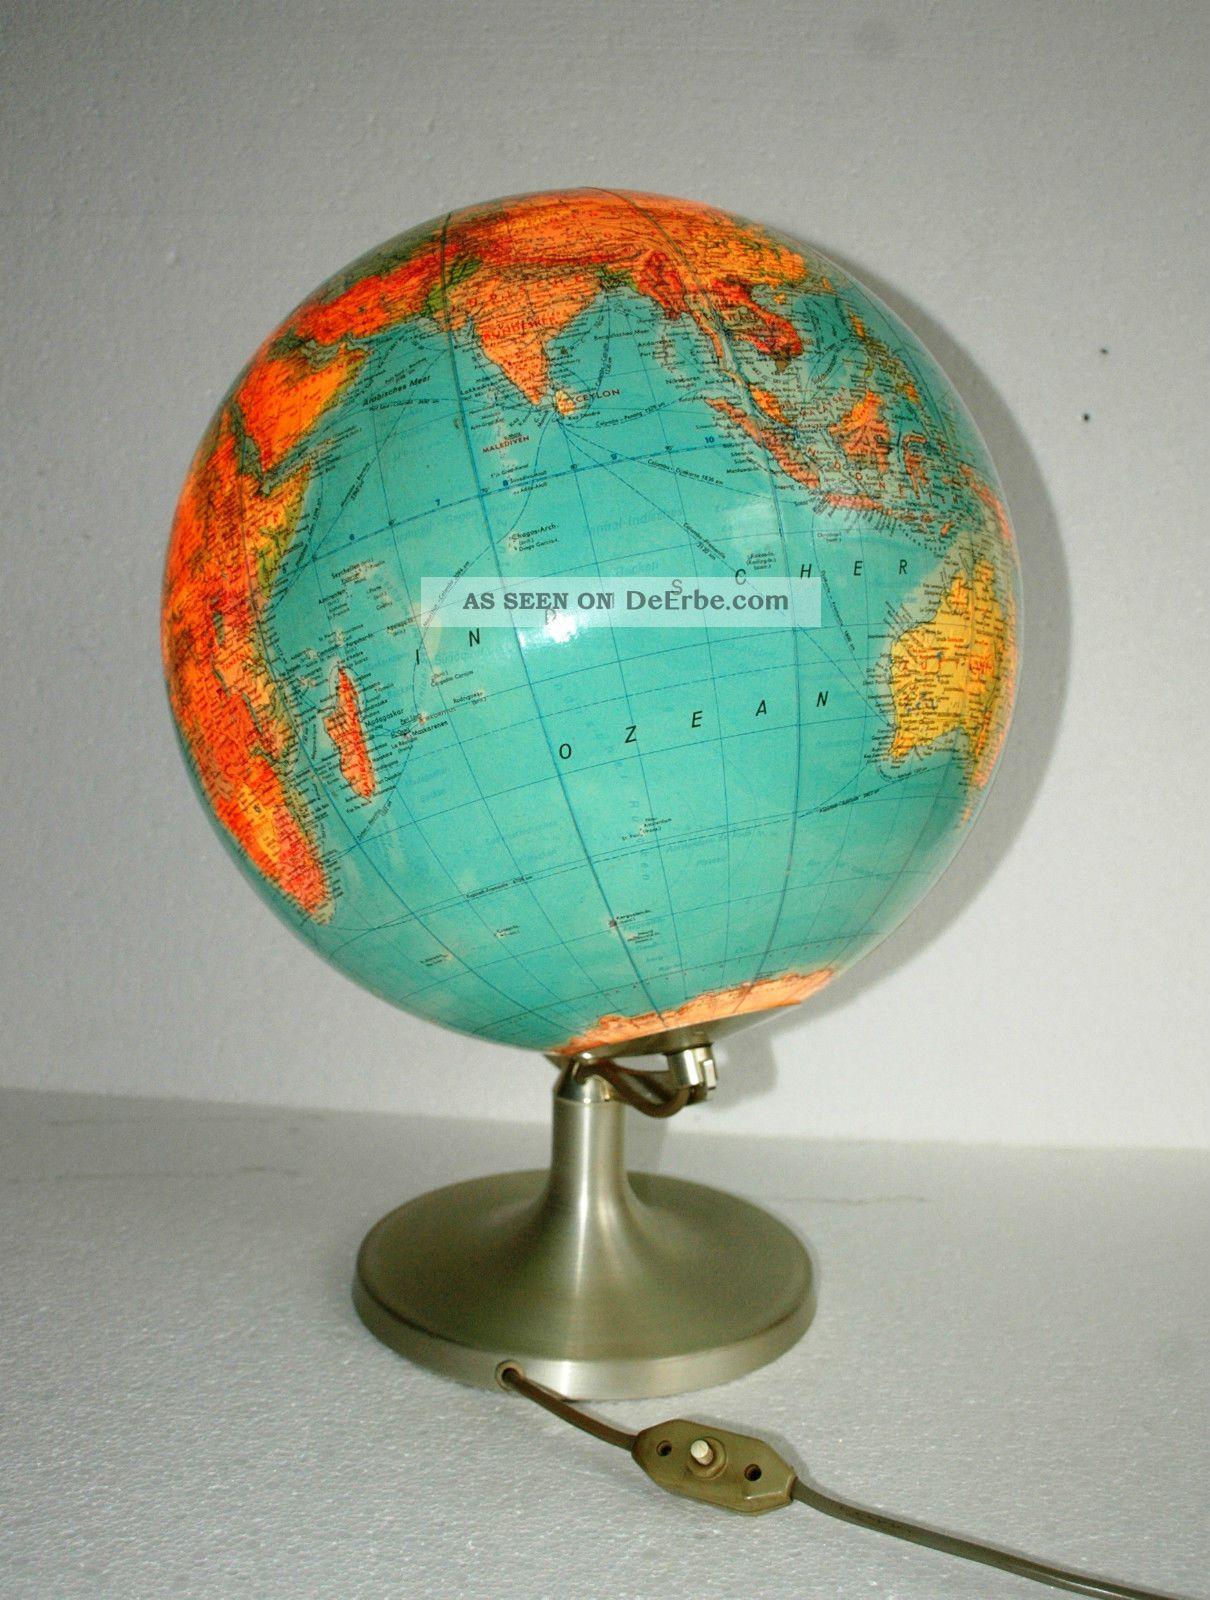 Erdglobus   tischglobus   jro   multi   globus   wohnung   büro ...